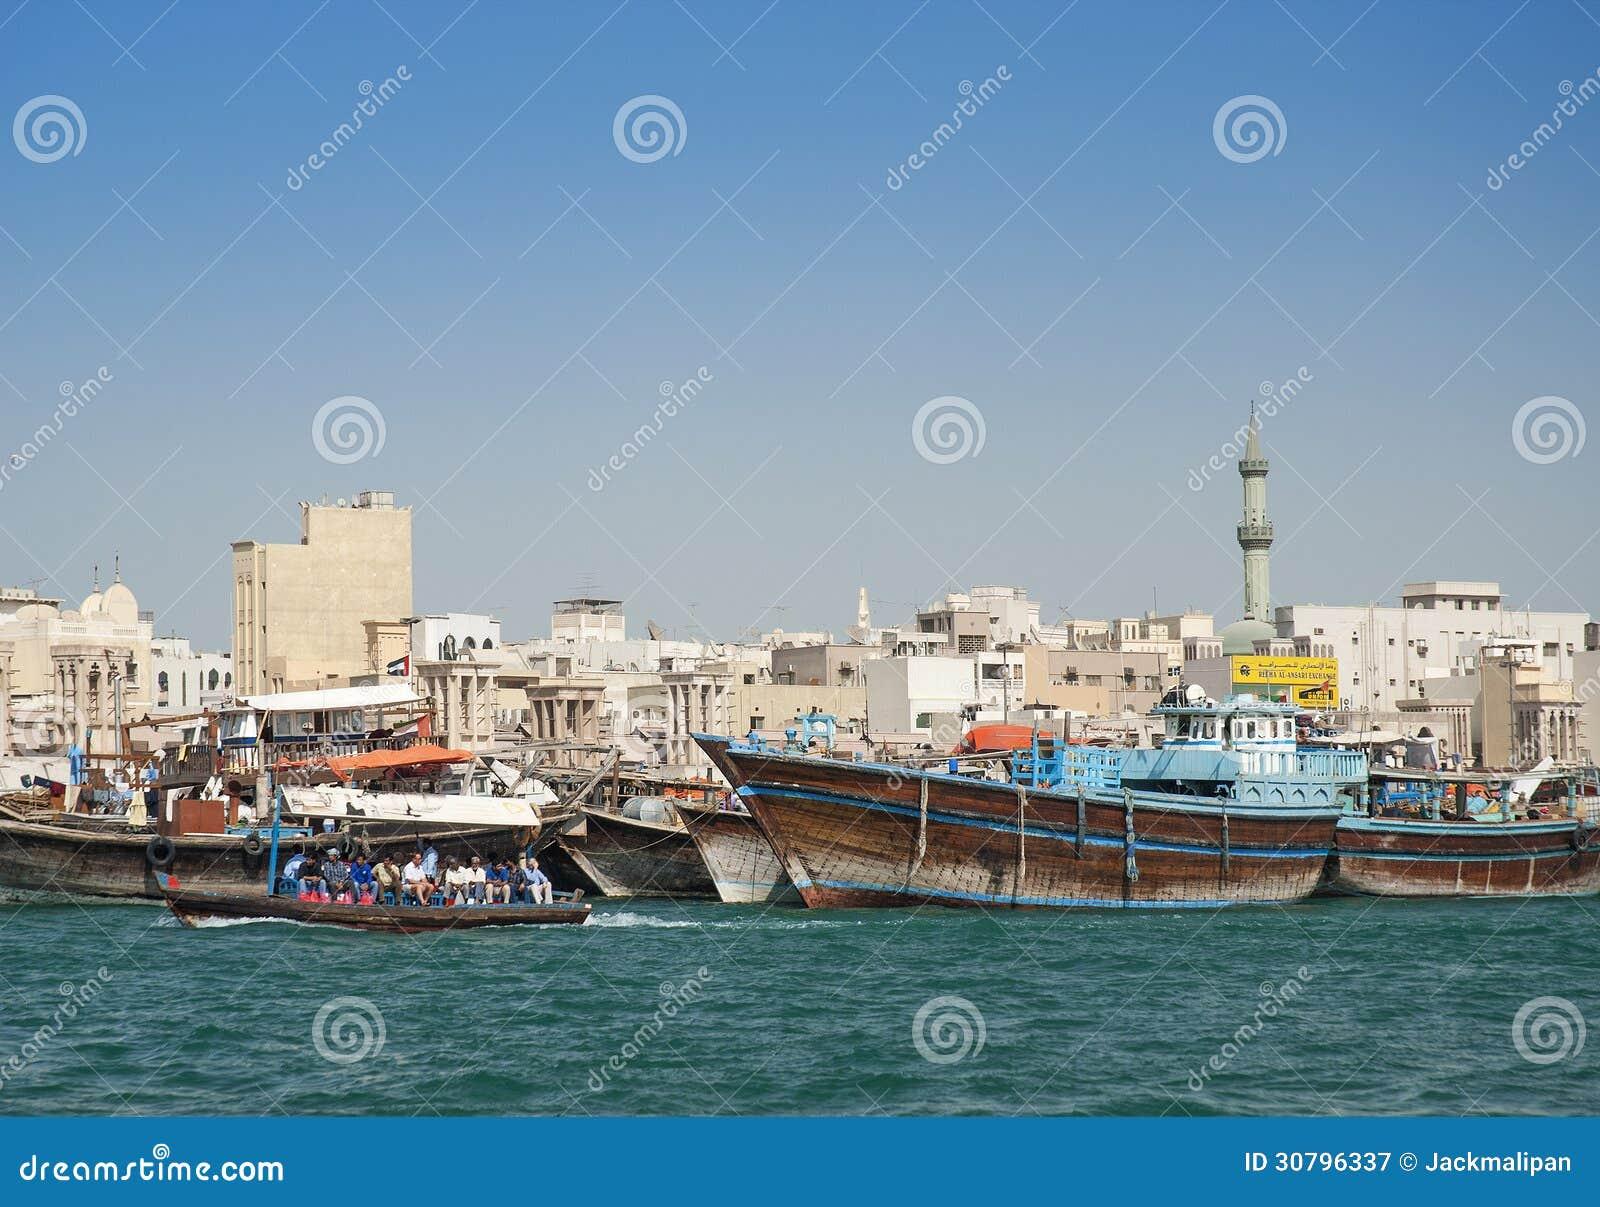 Fishing boats in dubai harbour editorial photography for Fishing in dubai